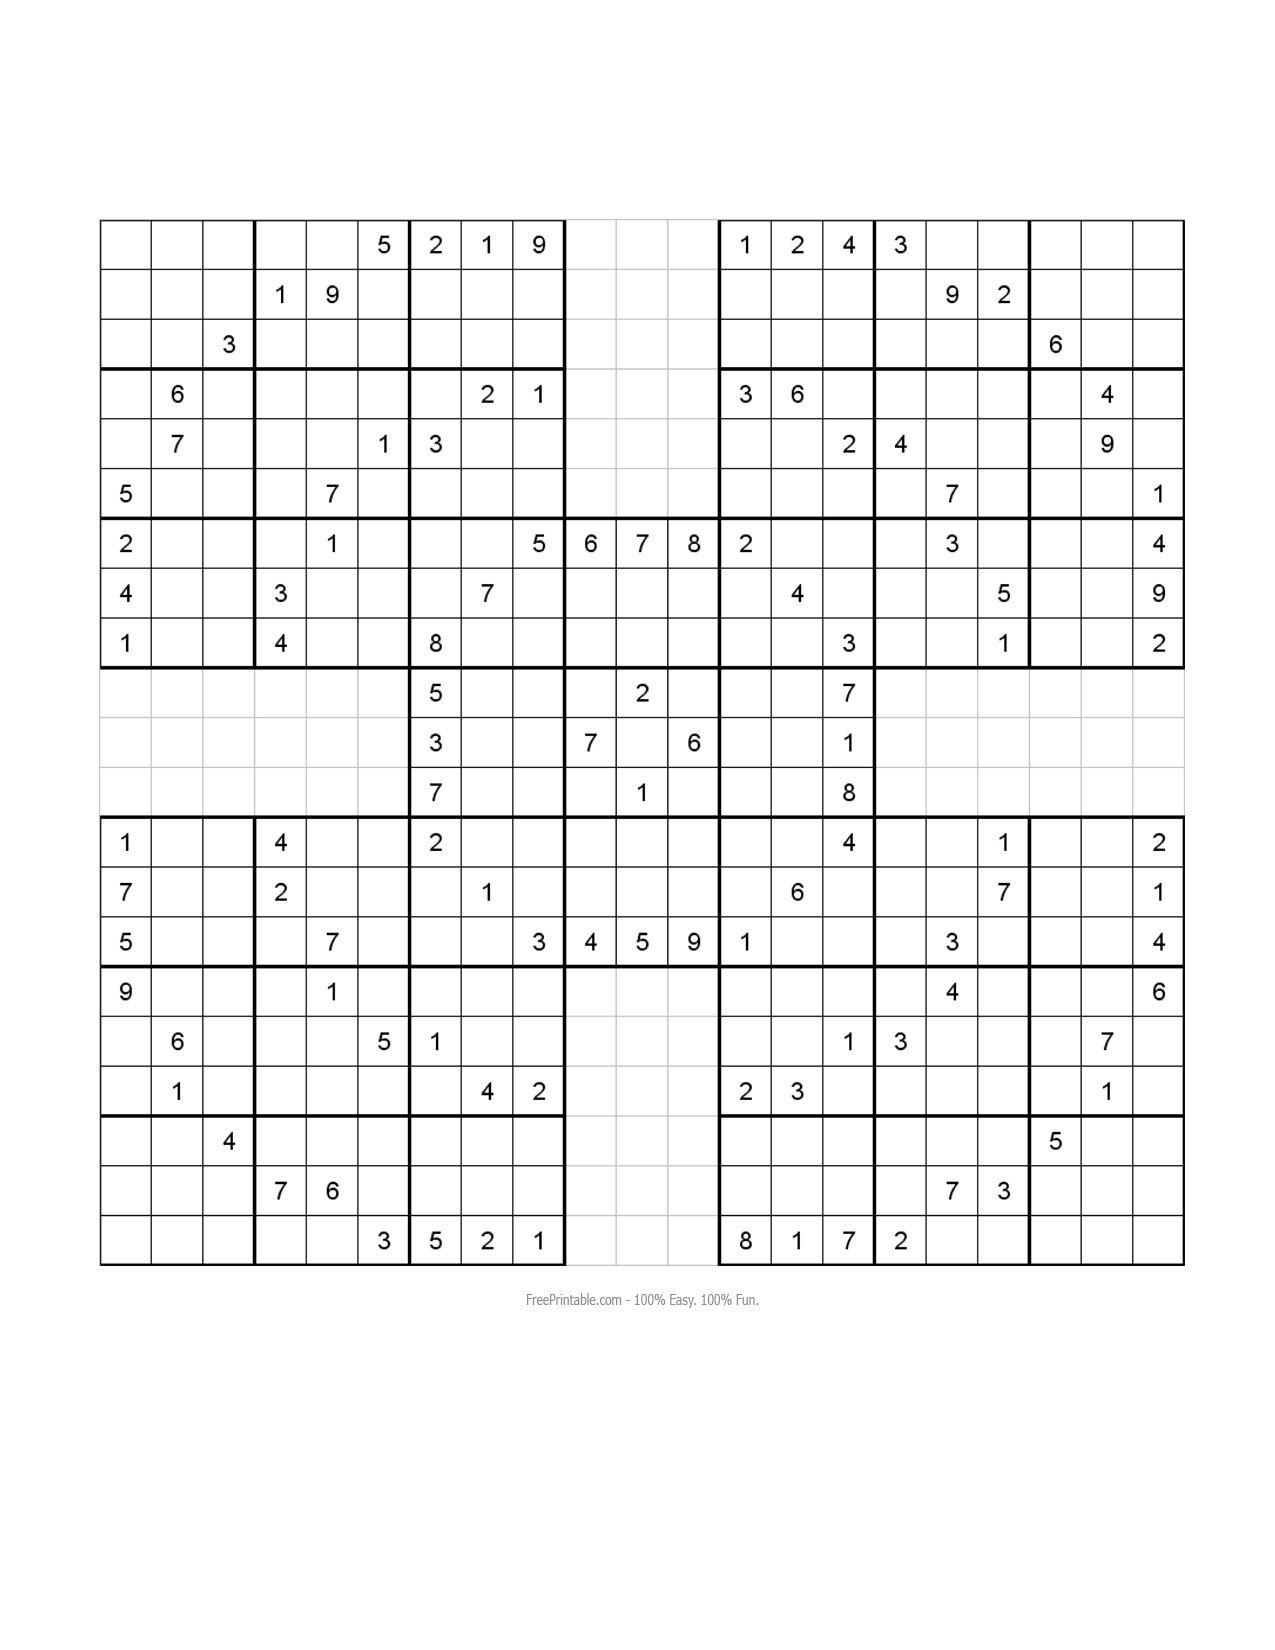 Free Printable Samurai Sudoku Puzzles | Spellen | Spellen - Free Printable Samurai Sudoku